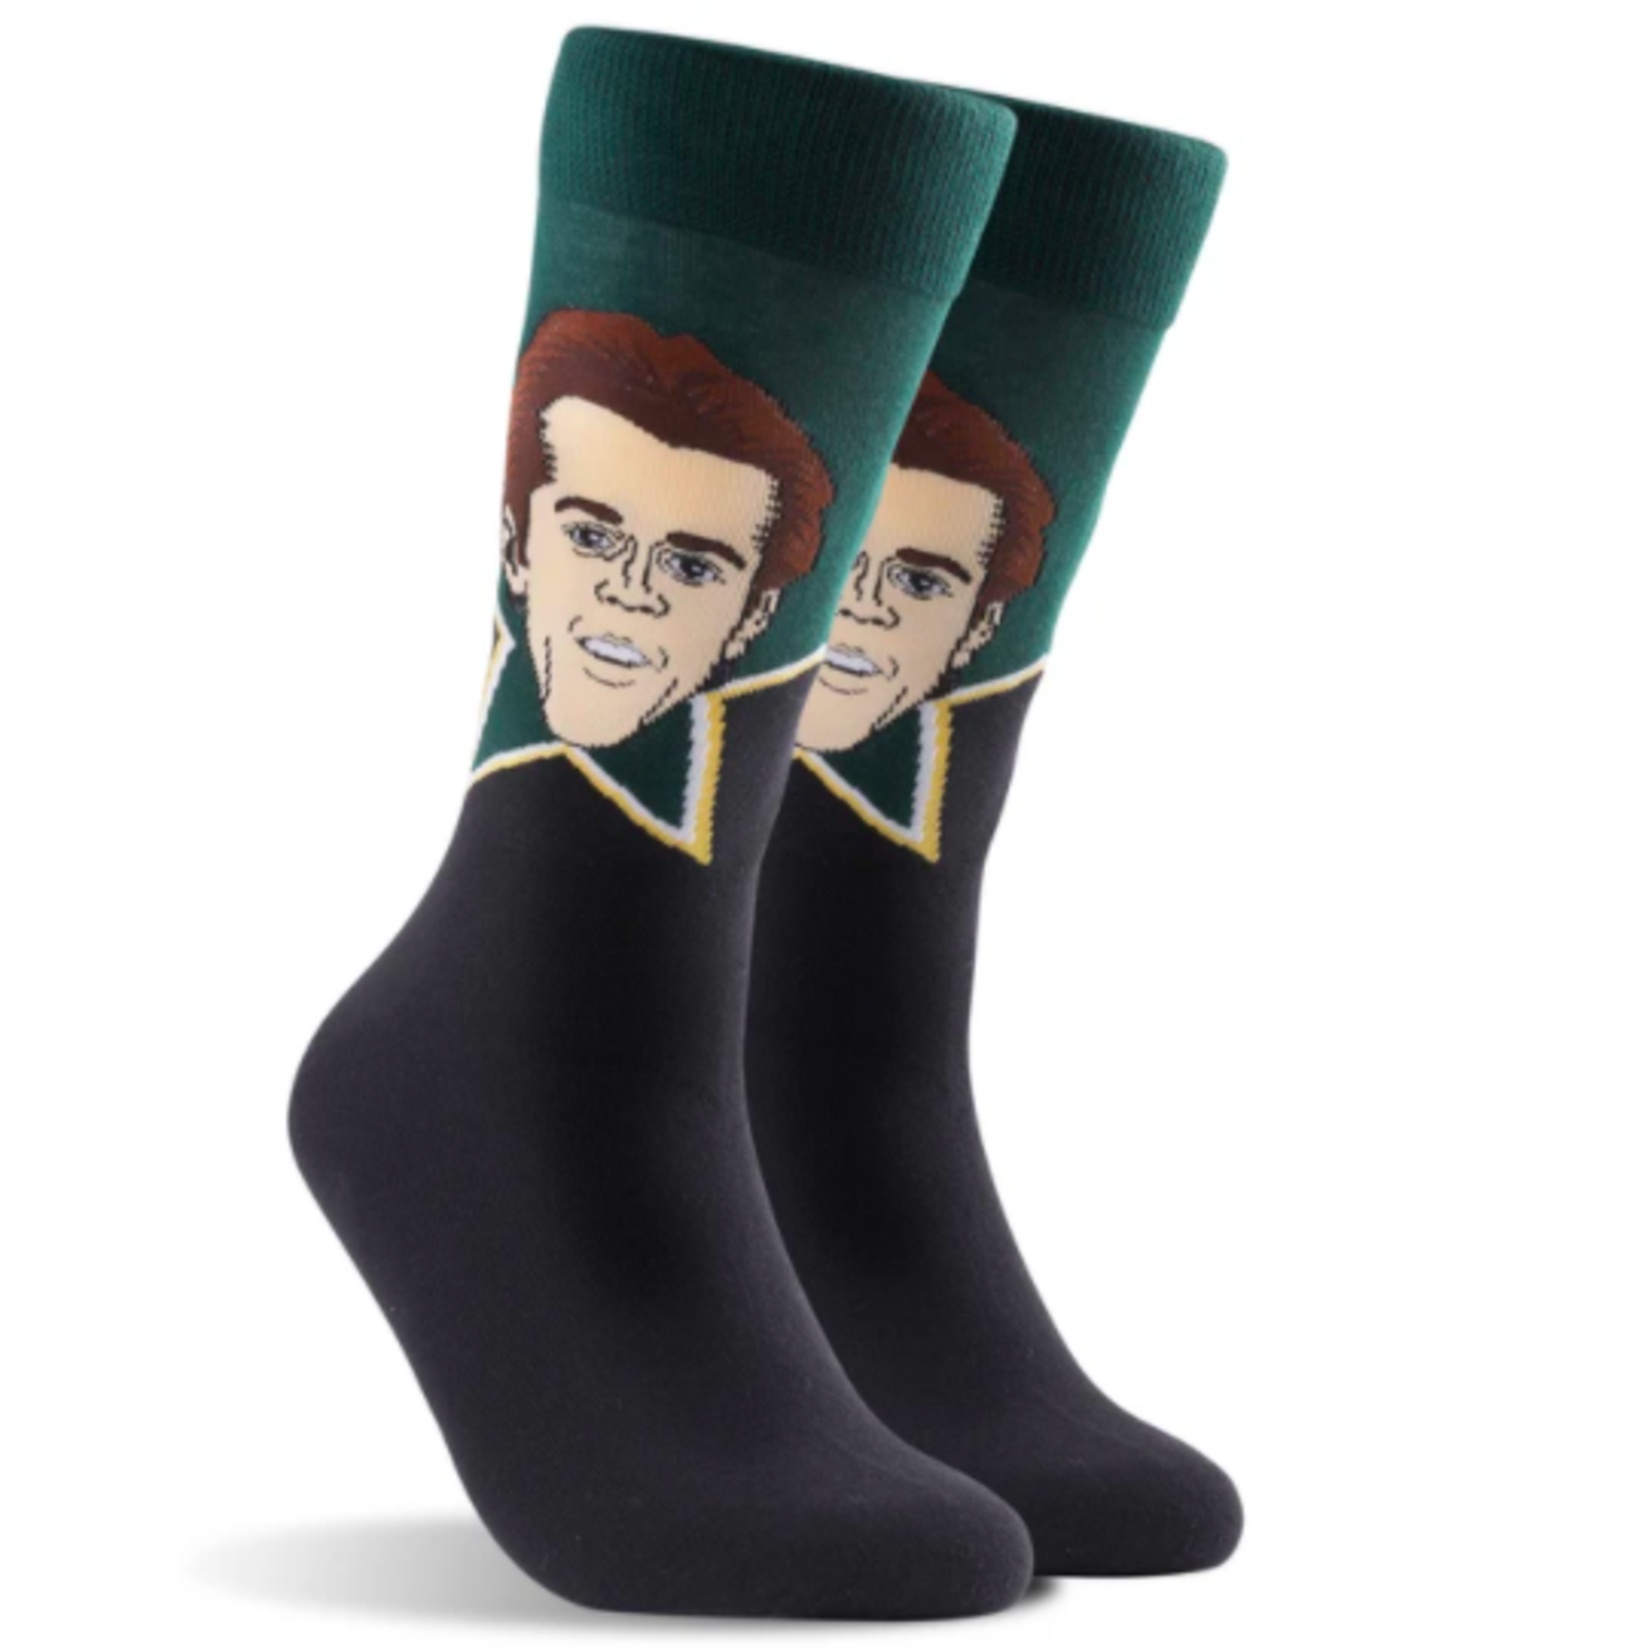 Major League Socks - Mike Modano